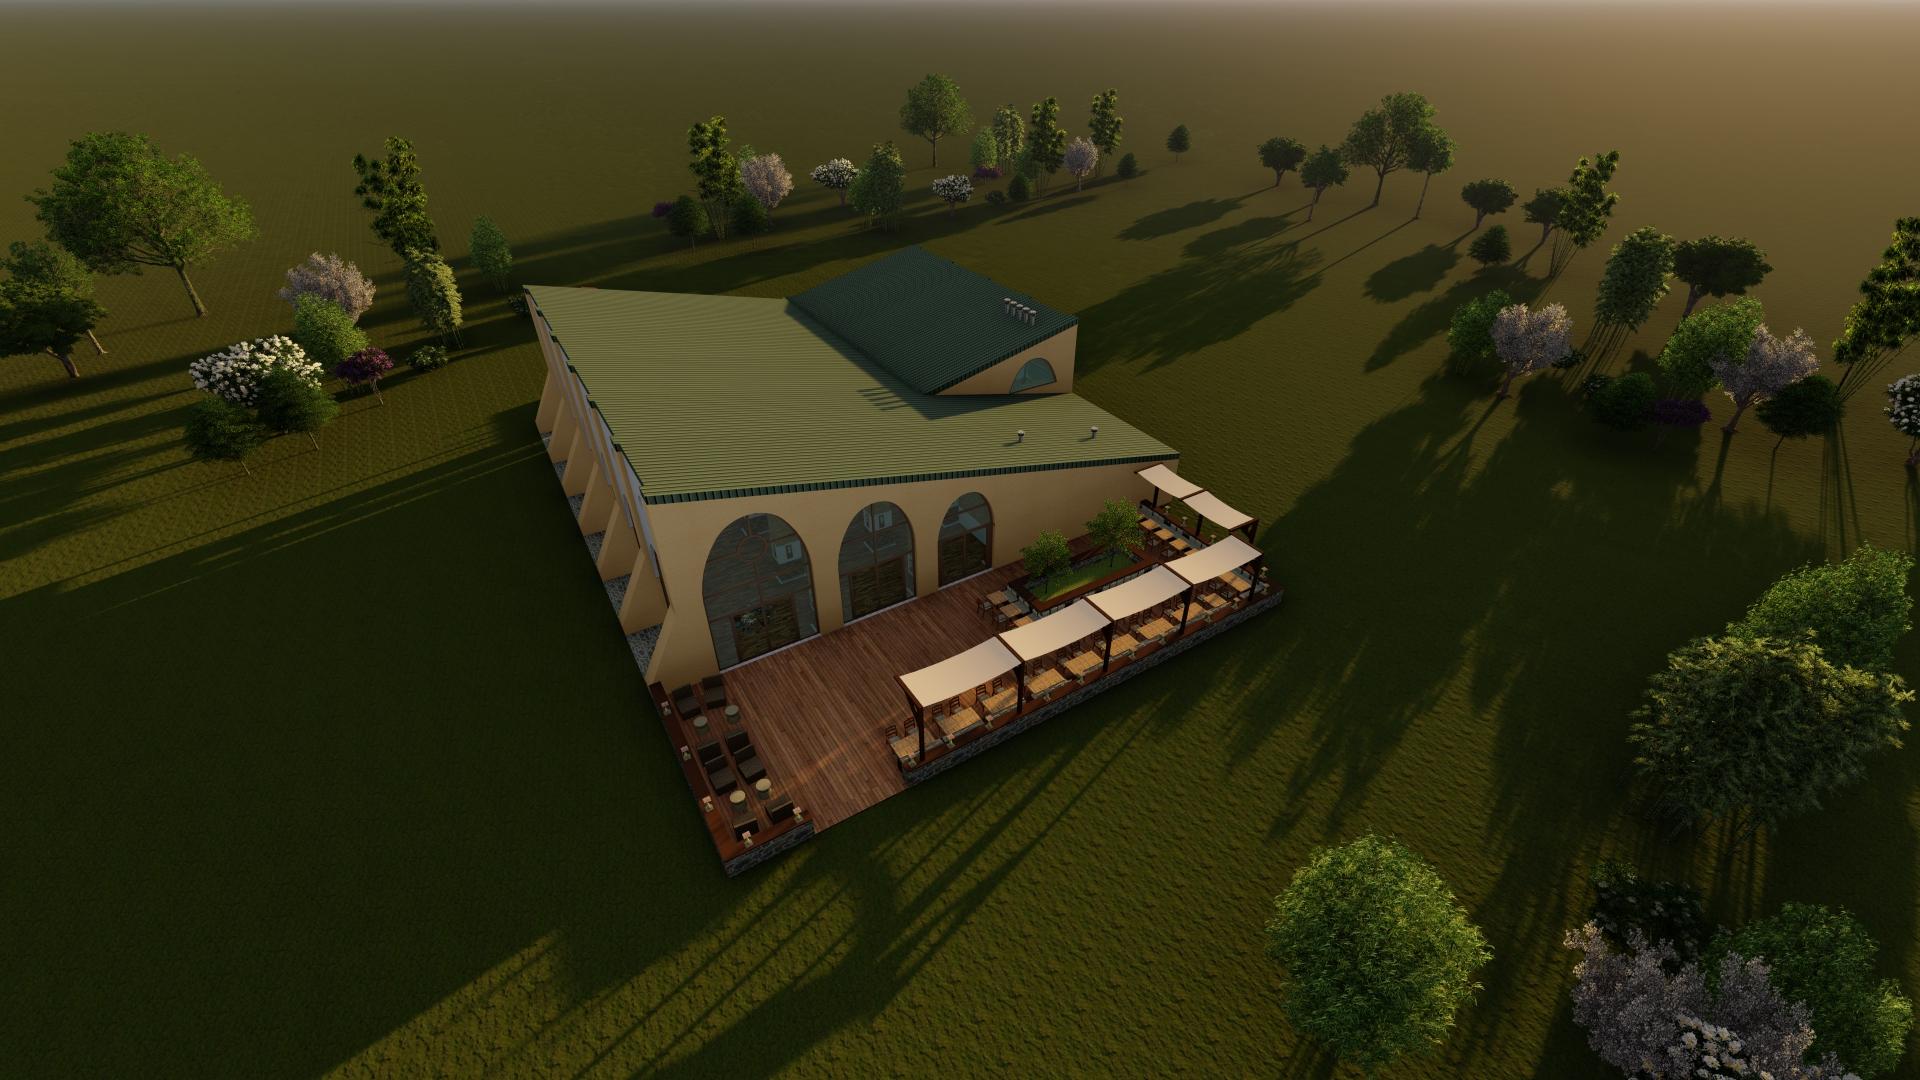 Doğa Oteli Kerpiç Restoran (7)